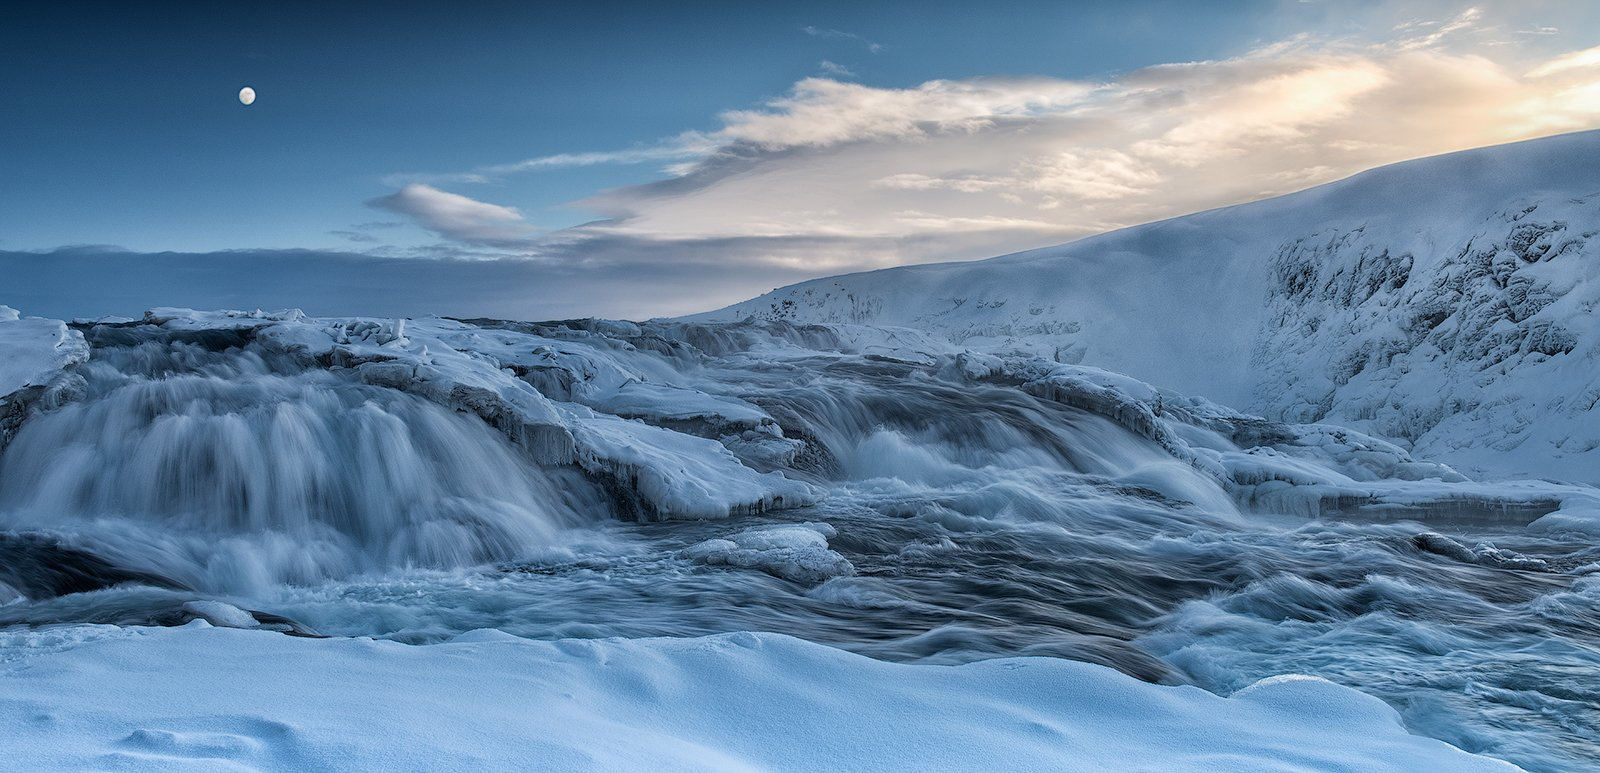 Галлфосс, Исландия, Alex Mimo